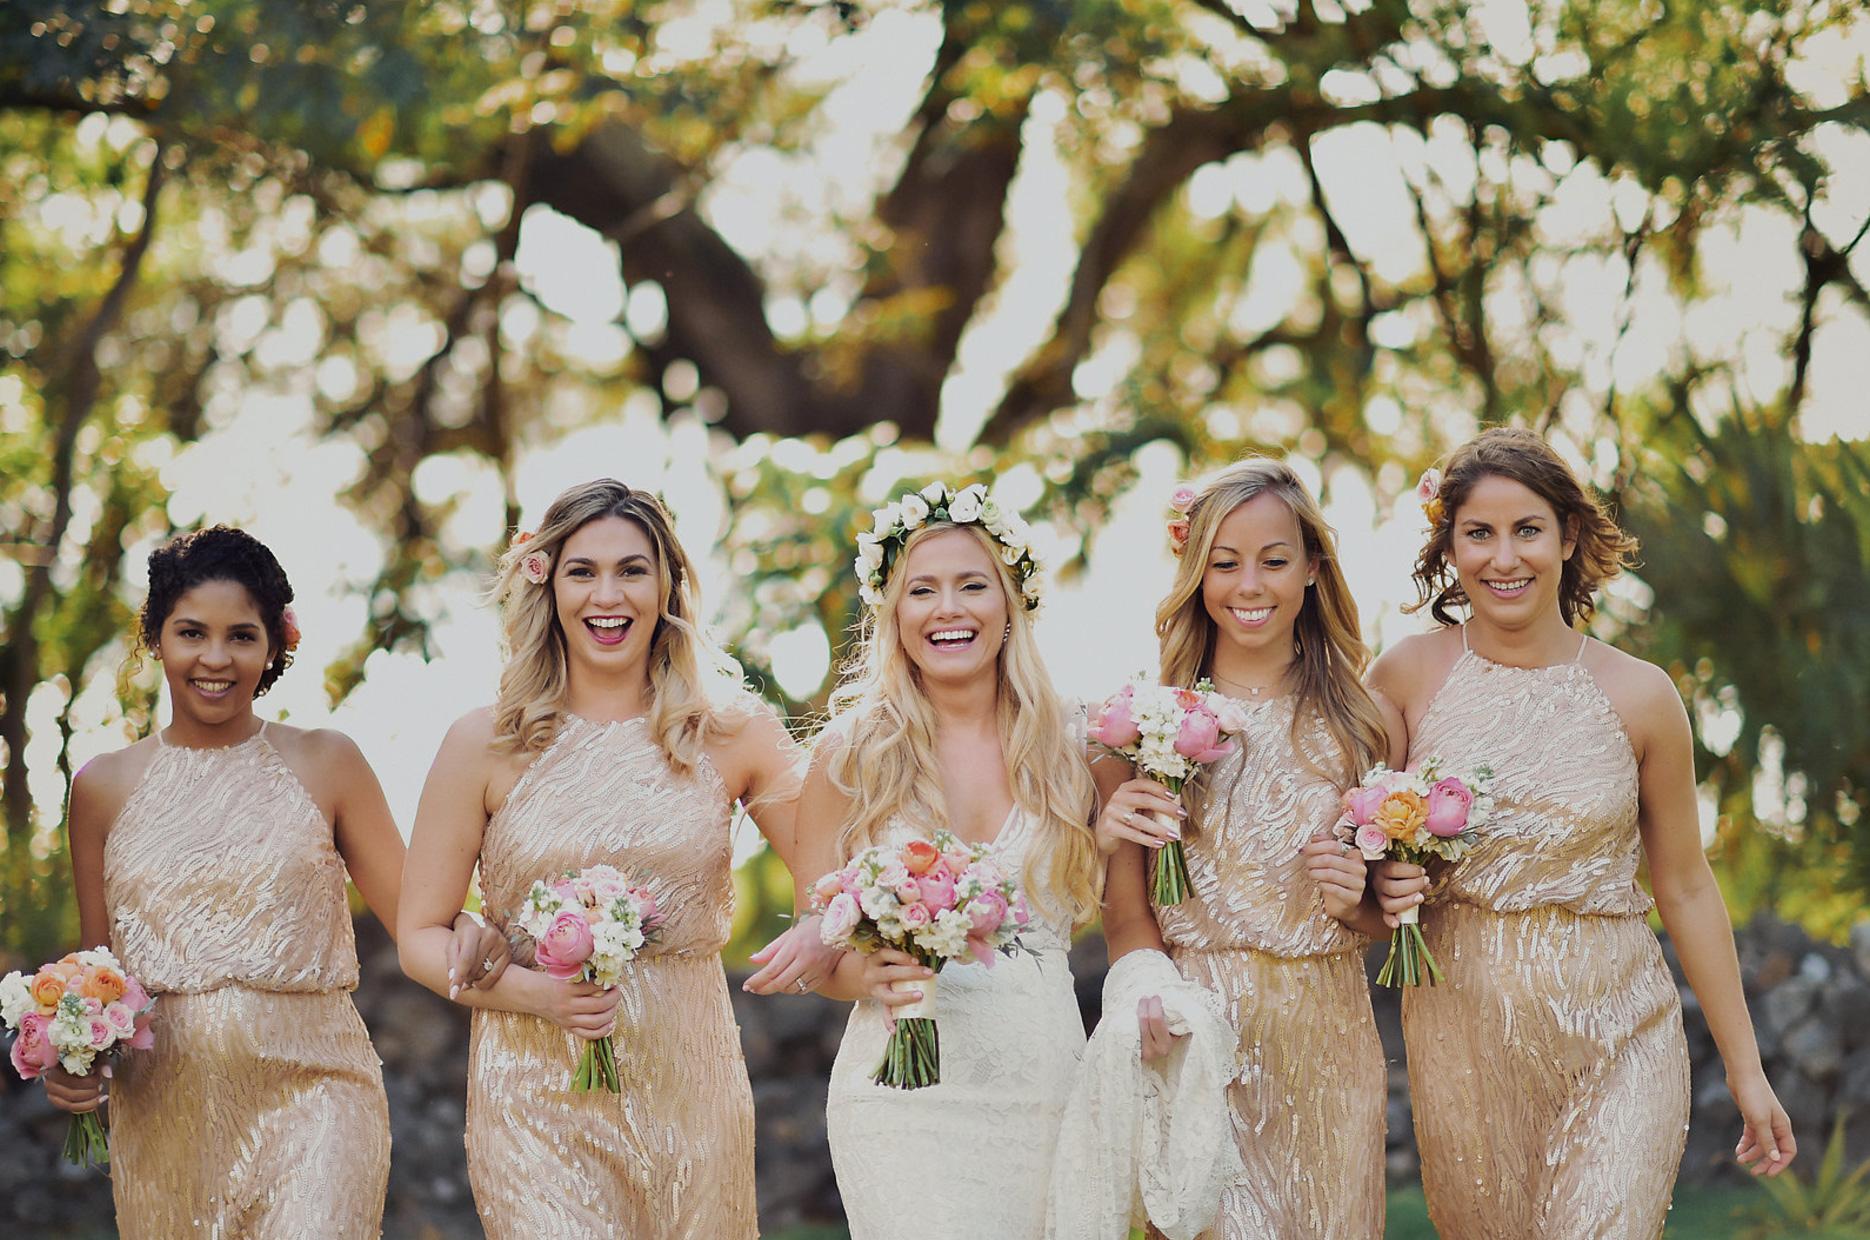 fun bridal party_edited.jpg